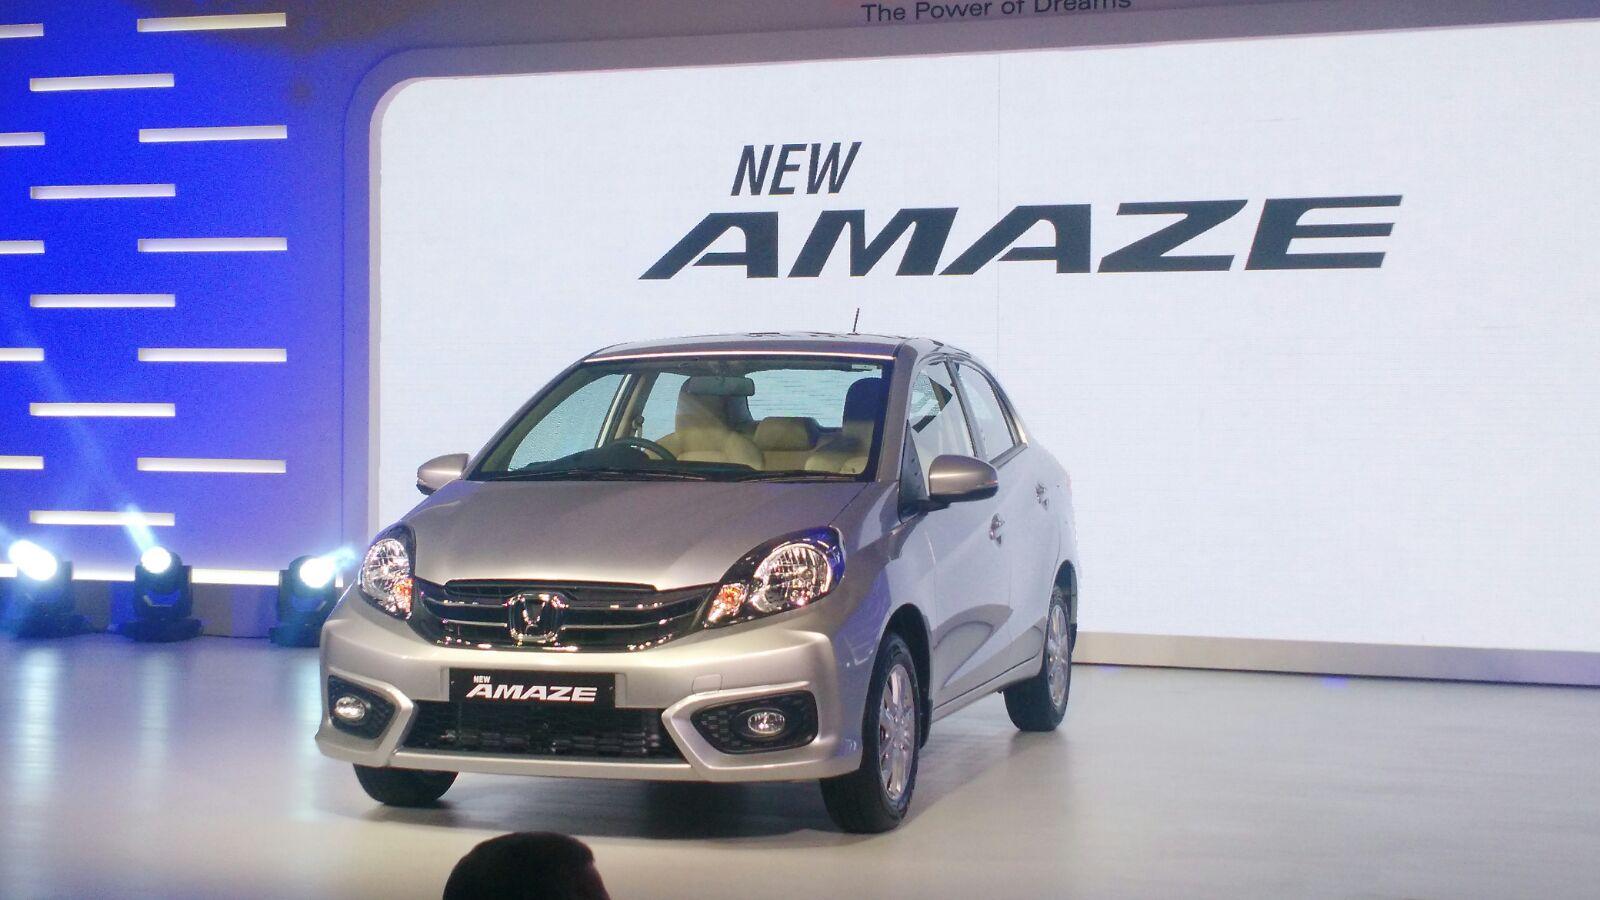 New 2016 Honda Amaze Price Features Specs Interiors